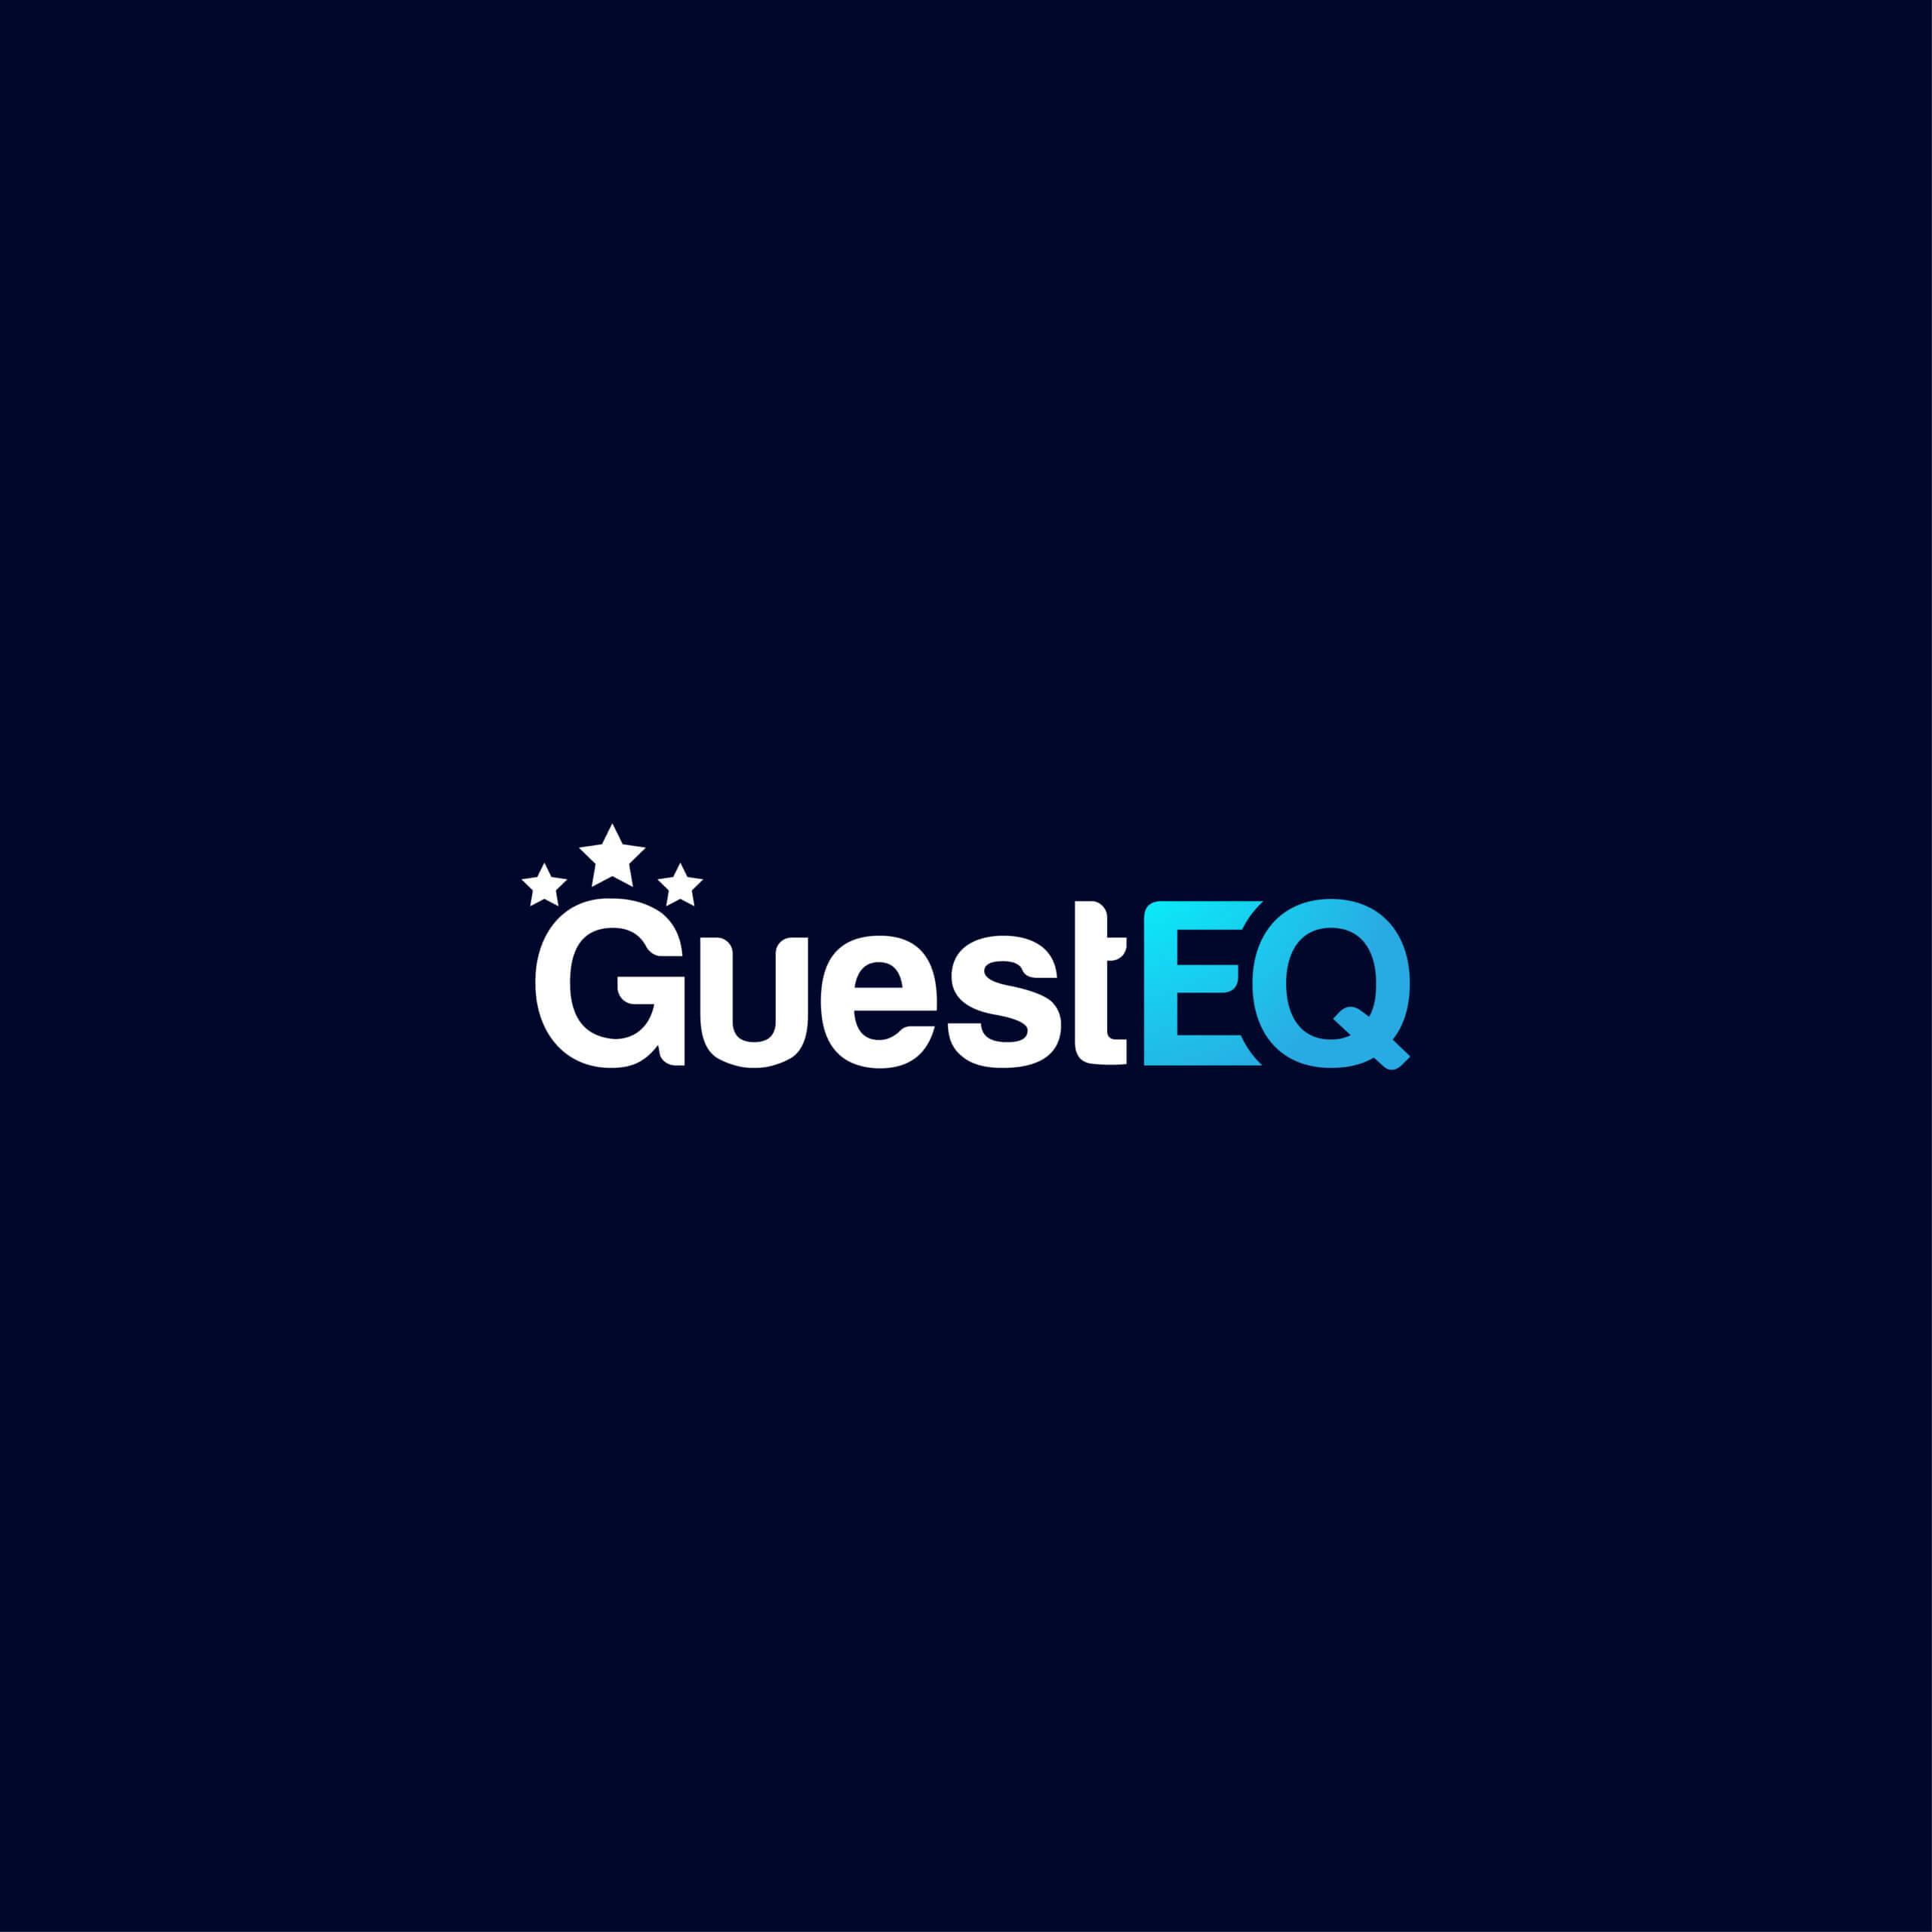 https://revenue-hub.com/wp-content/uploads/2021/03/guesteq-2.jpg